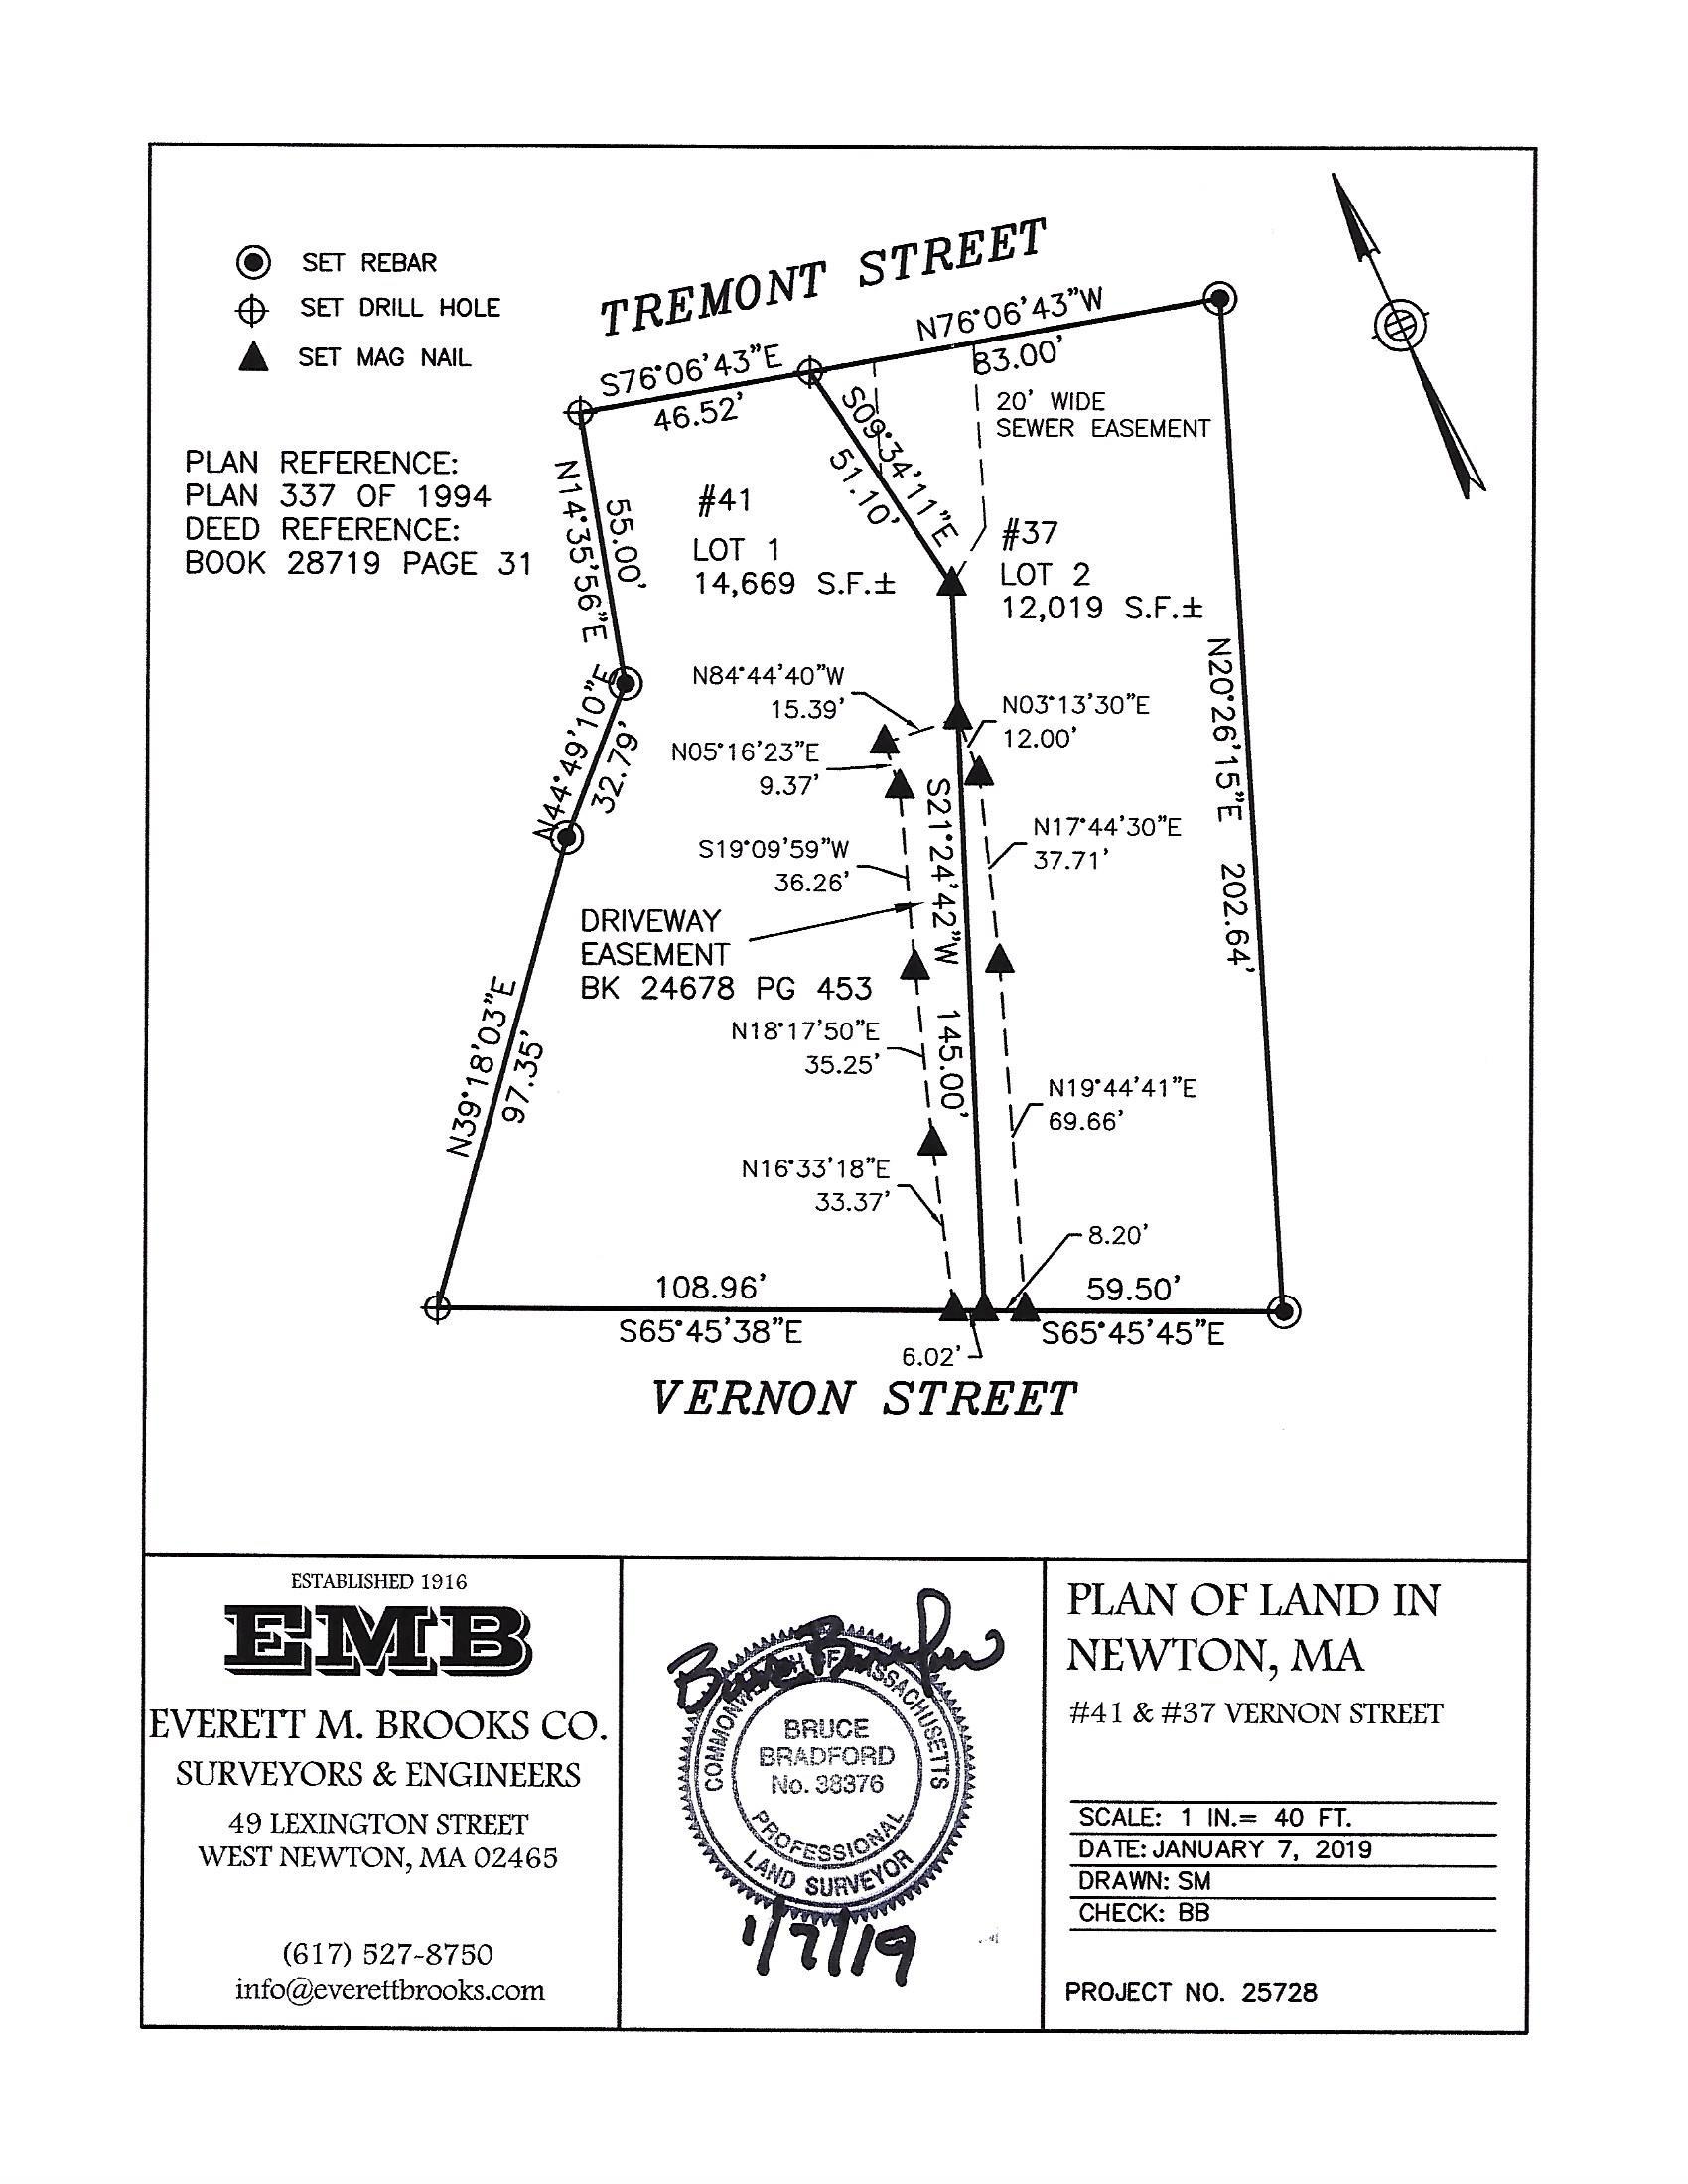 41 Vernon Street Driveway Easement